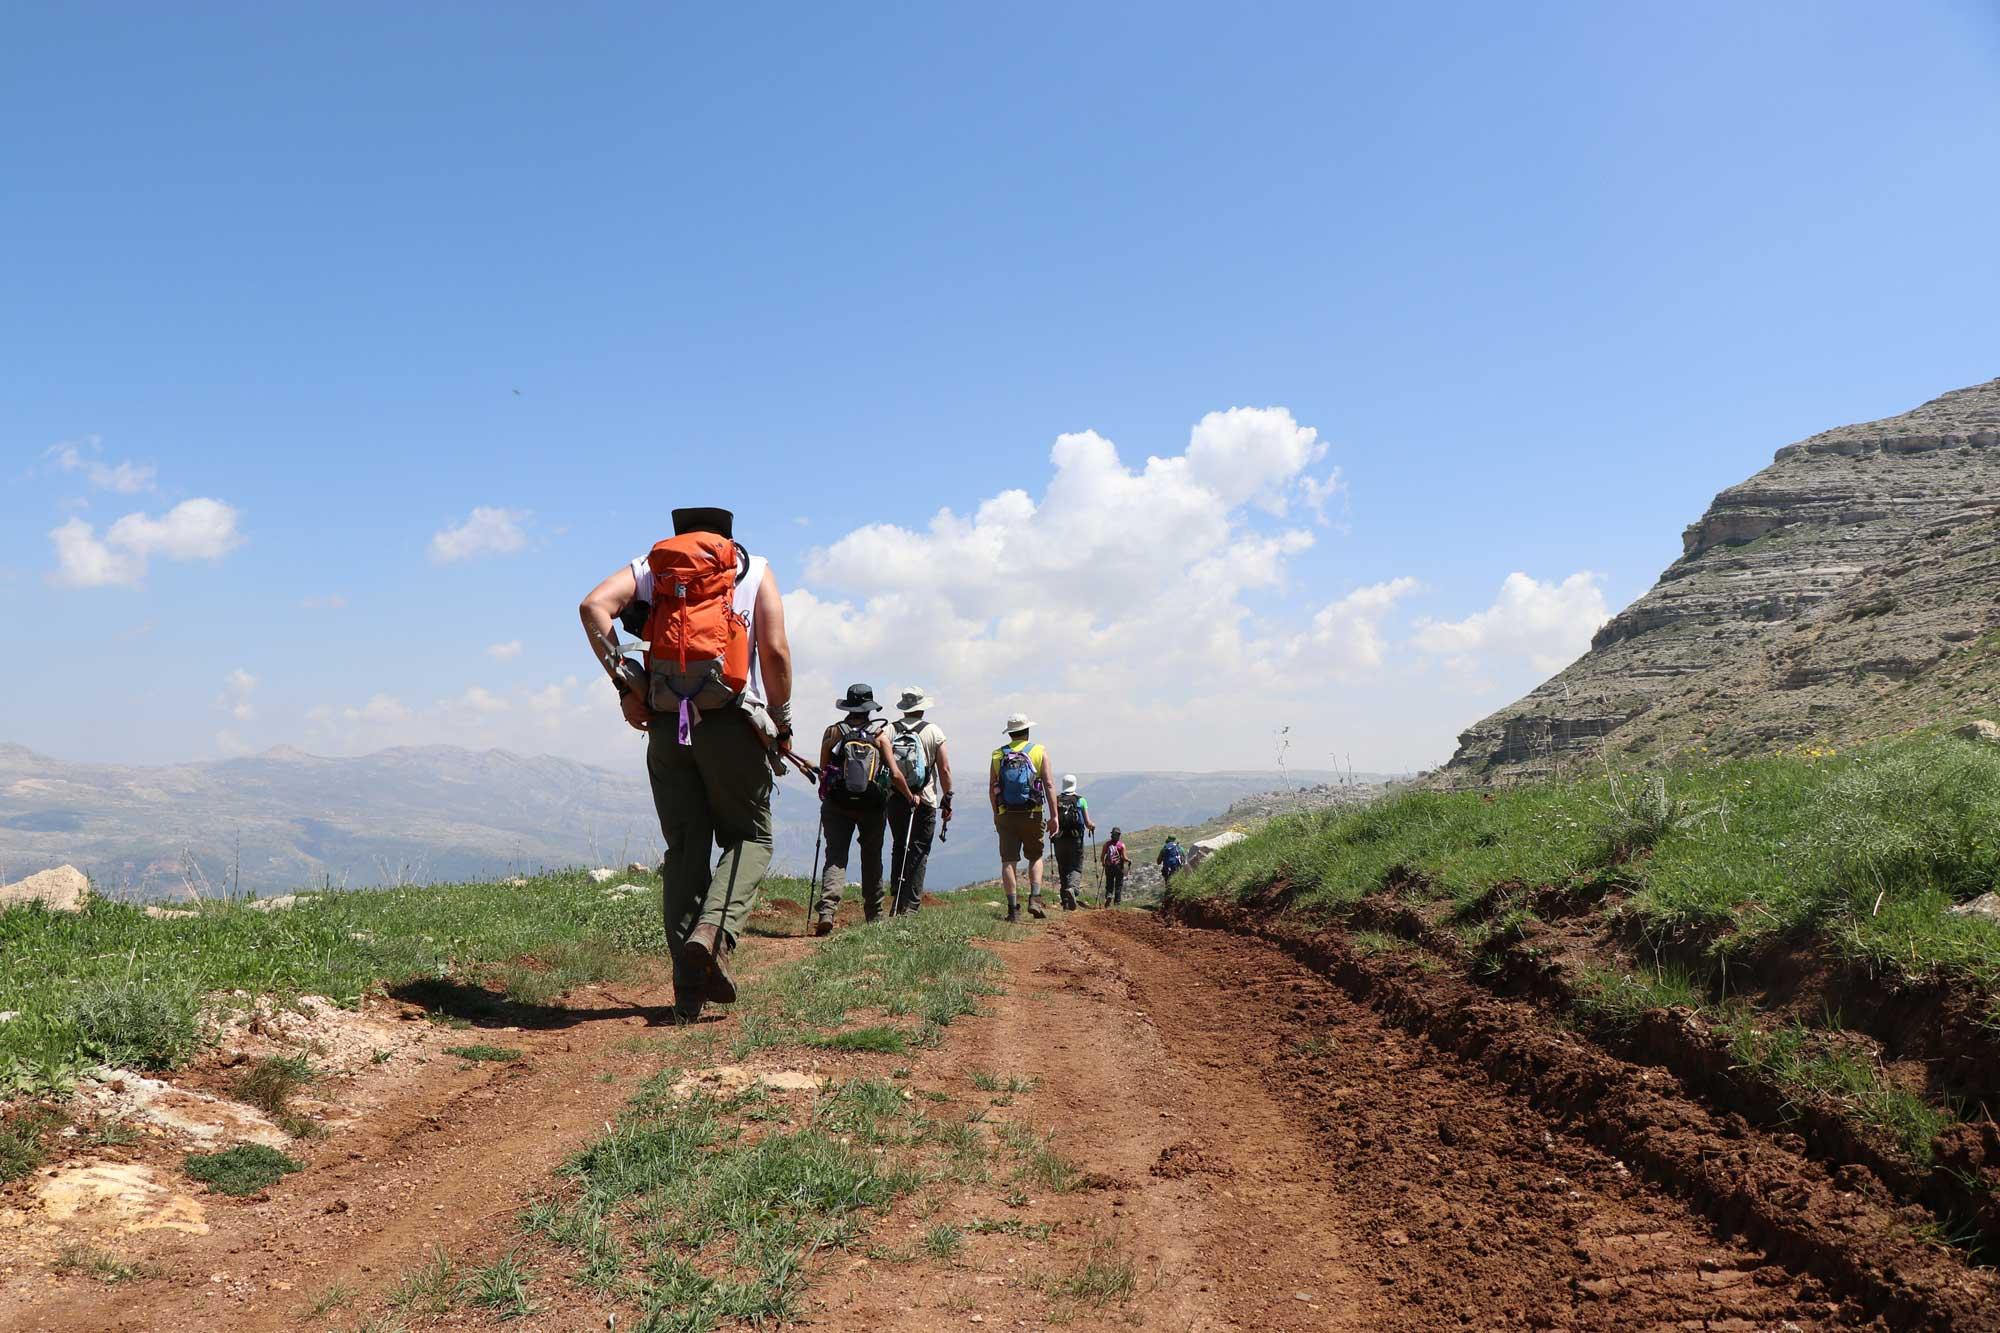 LMTA hike team